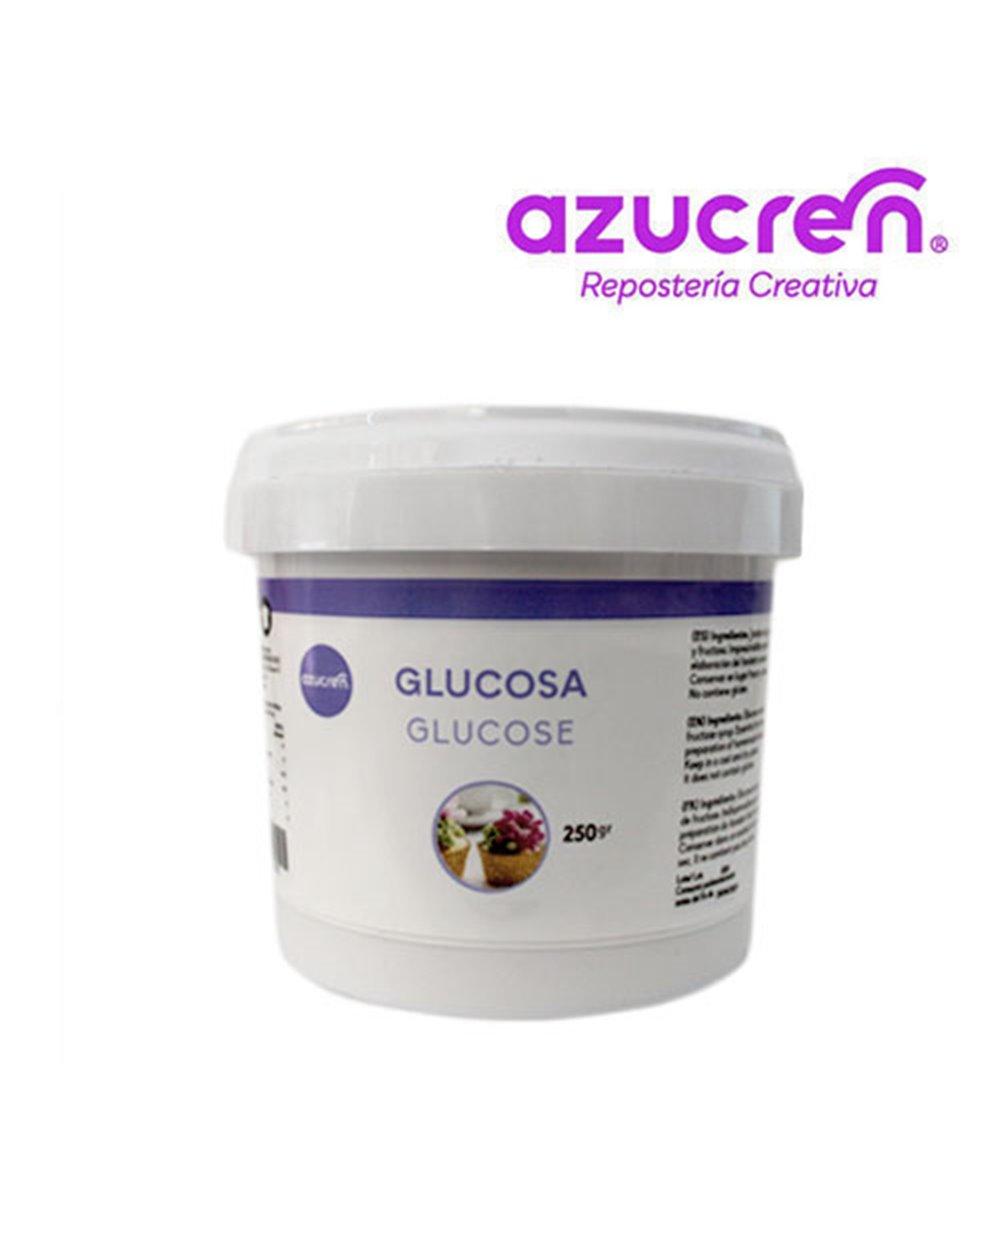 Azucren glucosa y fructosa 250g DE87282+